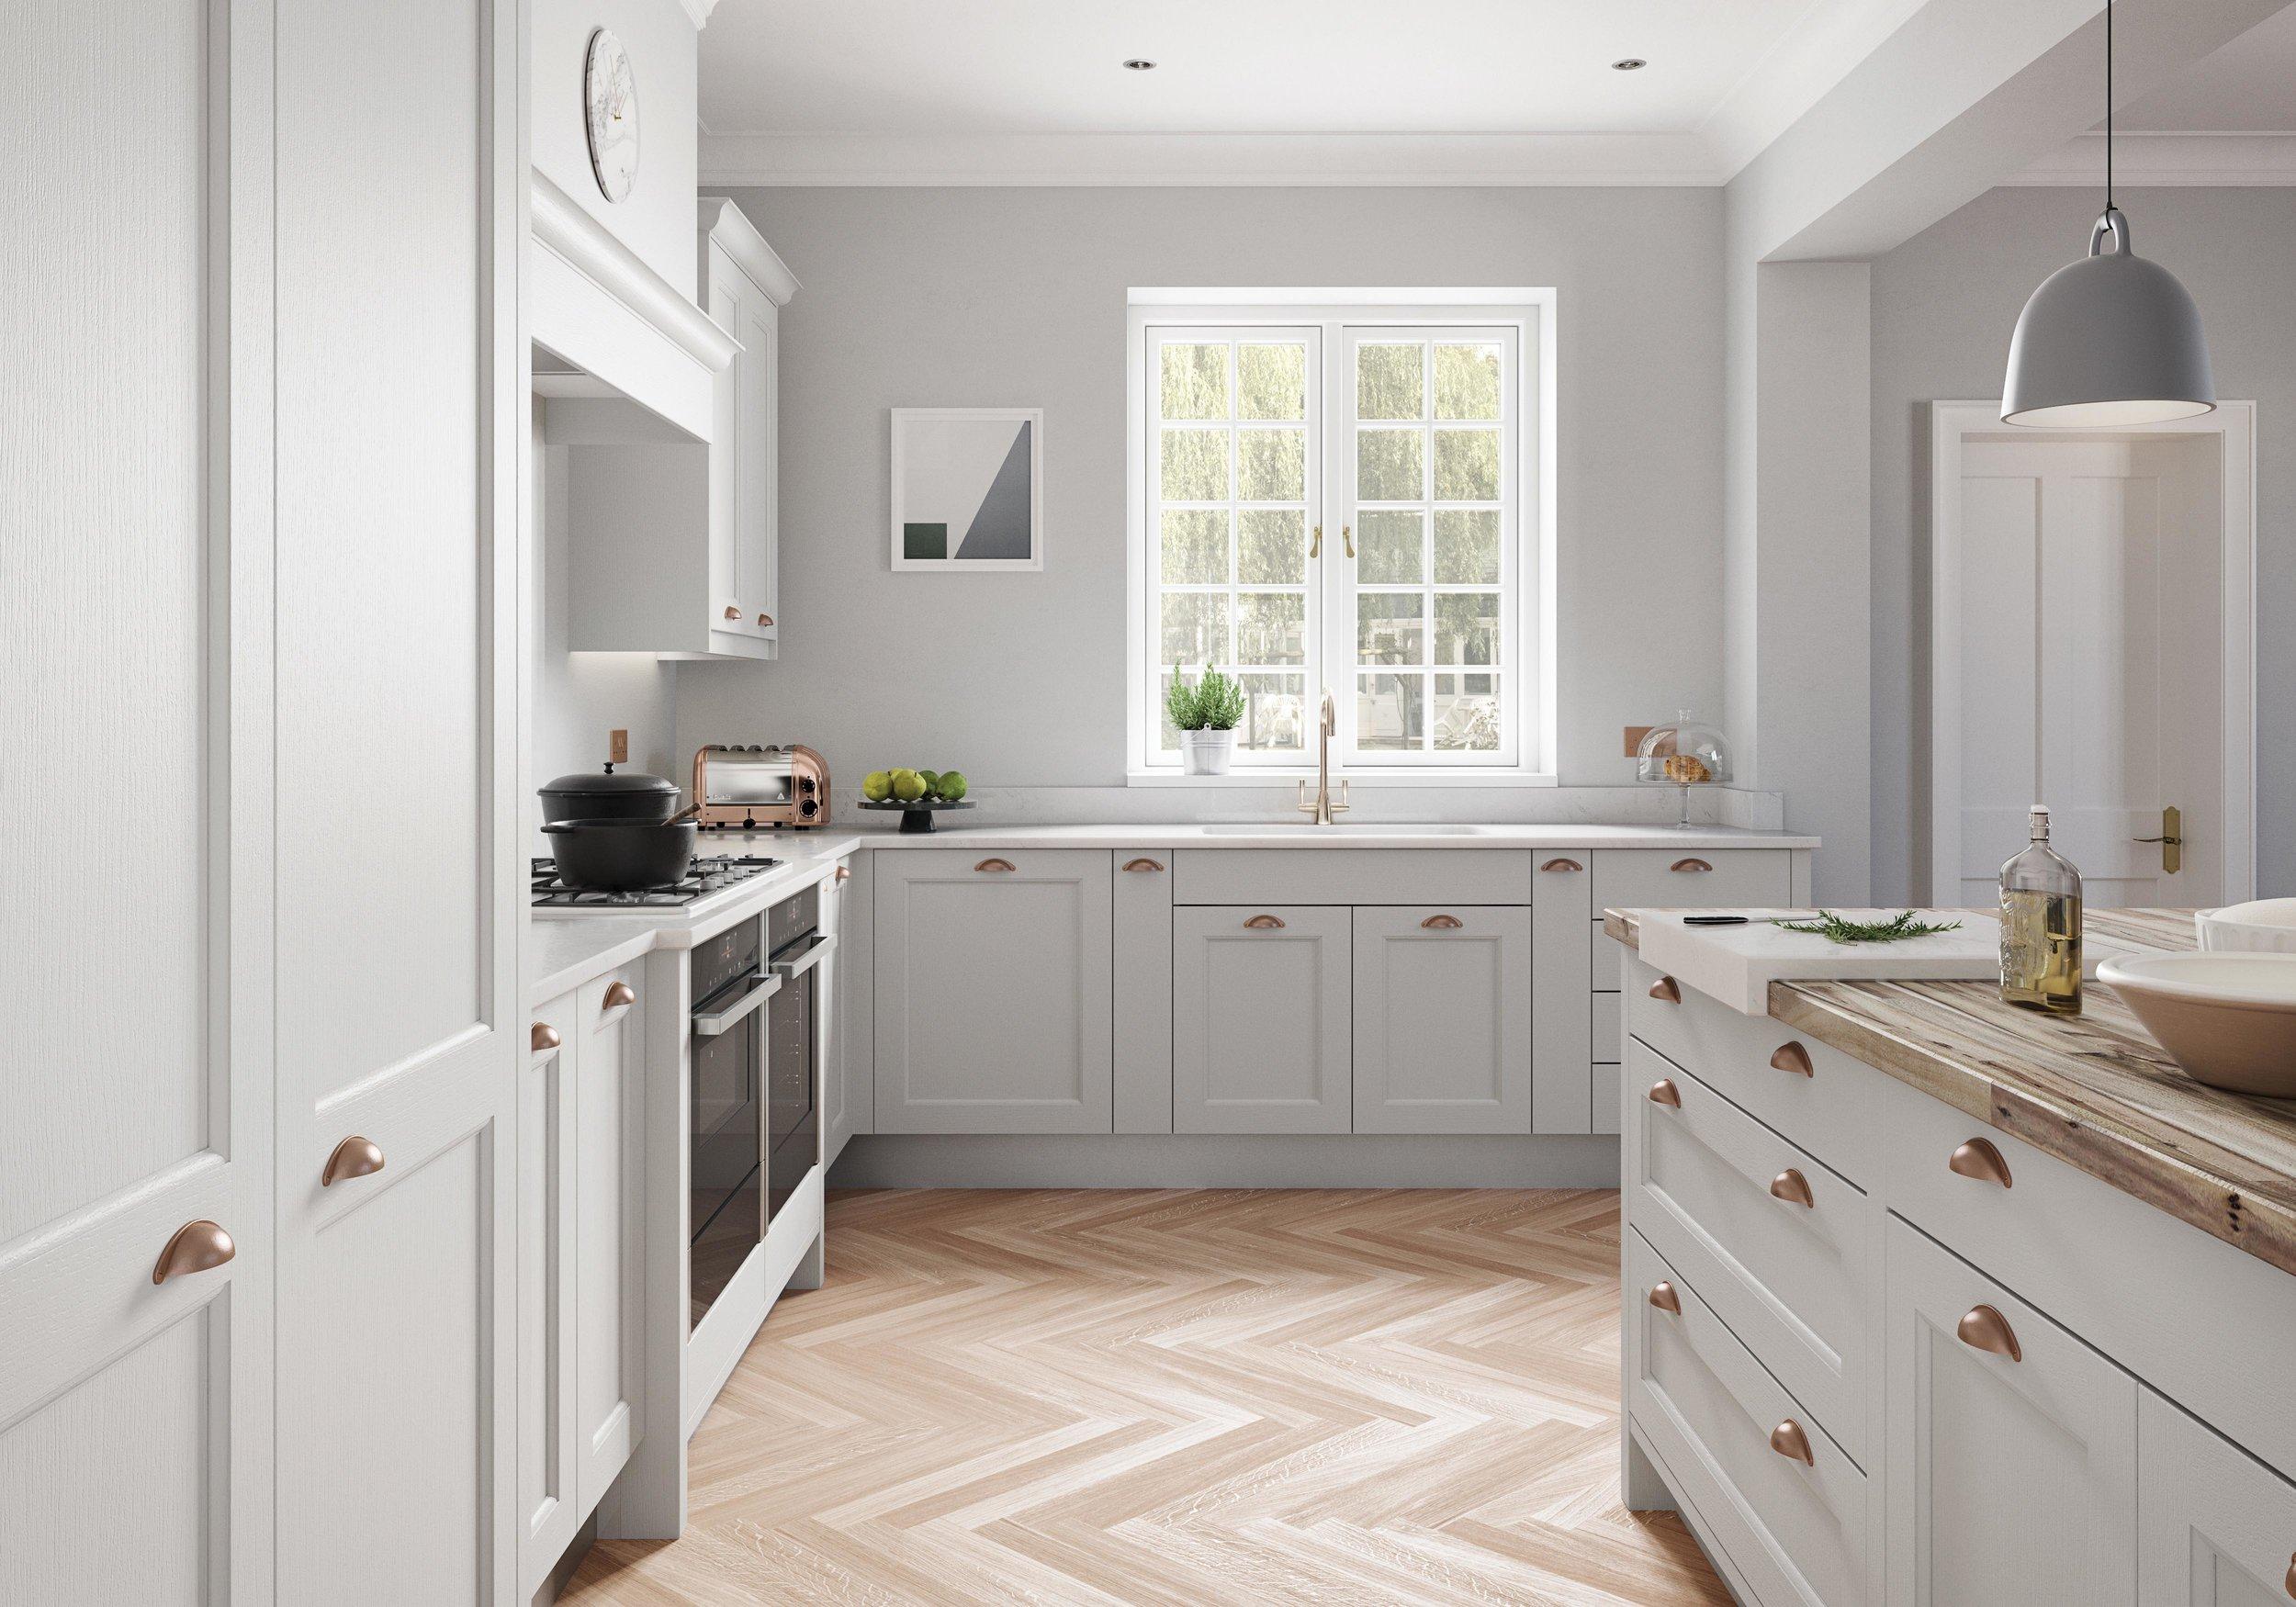 117517_PWS-Kitchen_Mornington-Beaded_Cam02_CMYK.jpg